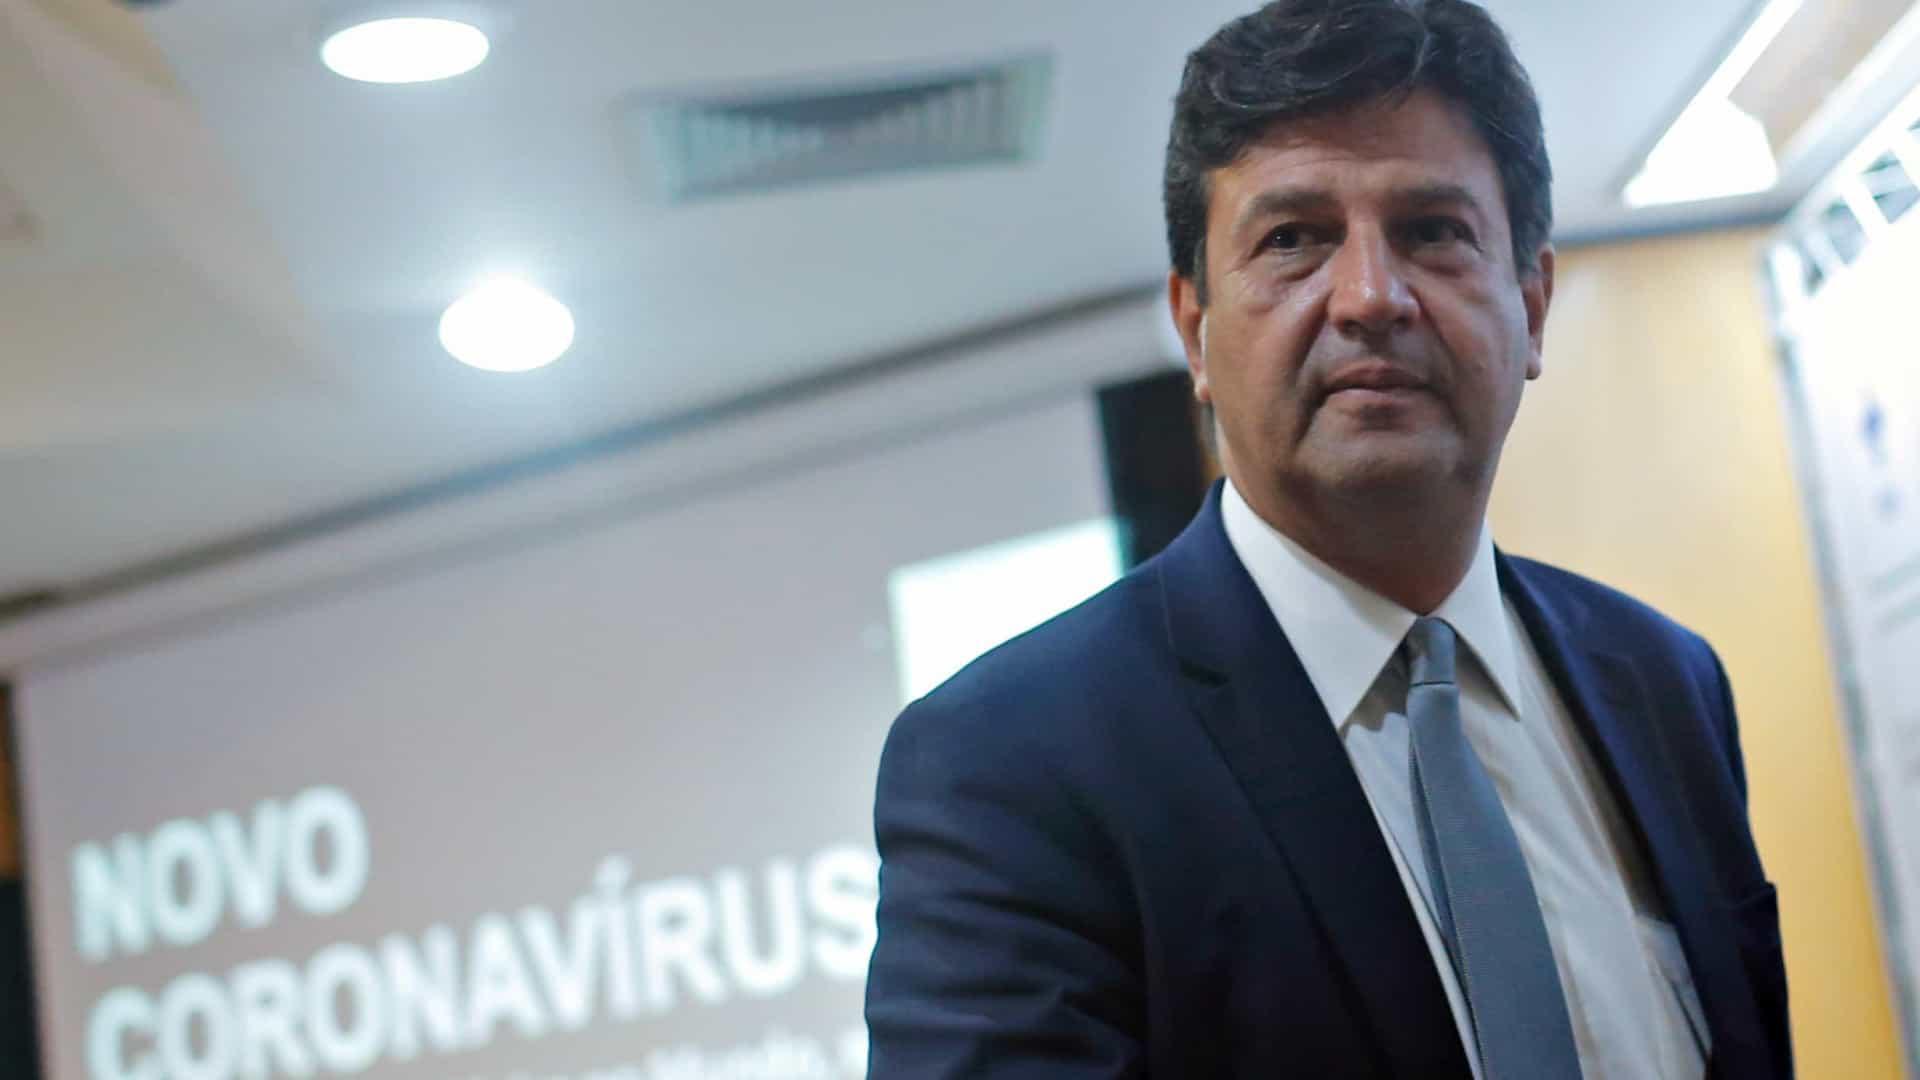 Mandetta, o ministro de Bolsonaro que provoca ciúmes no Planalto